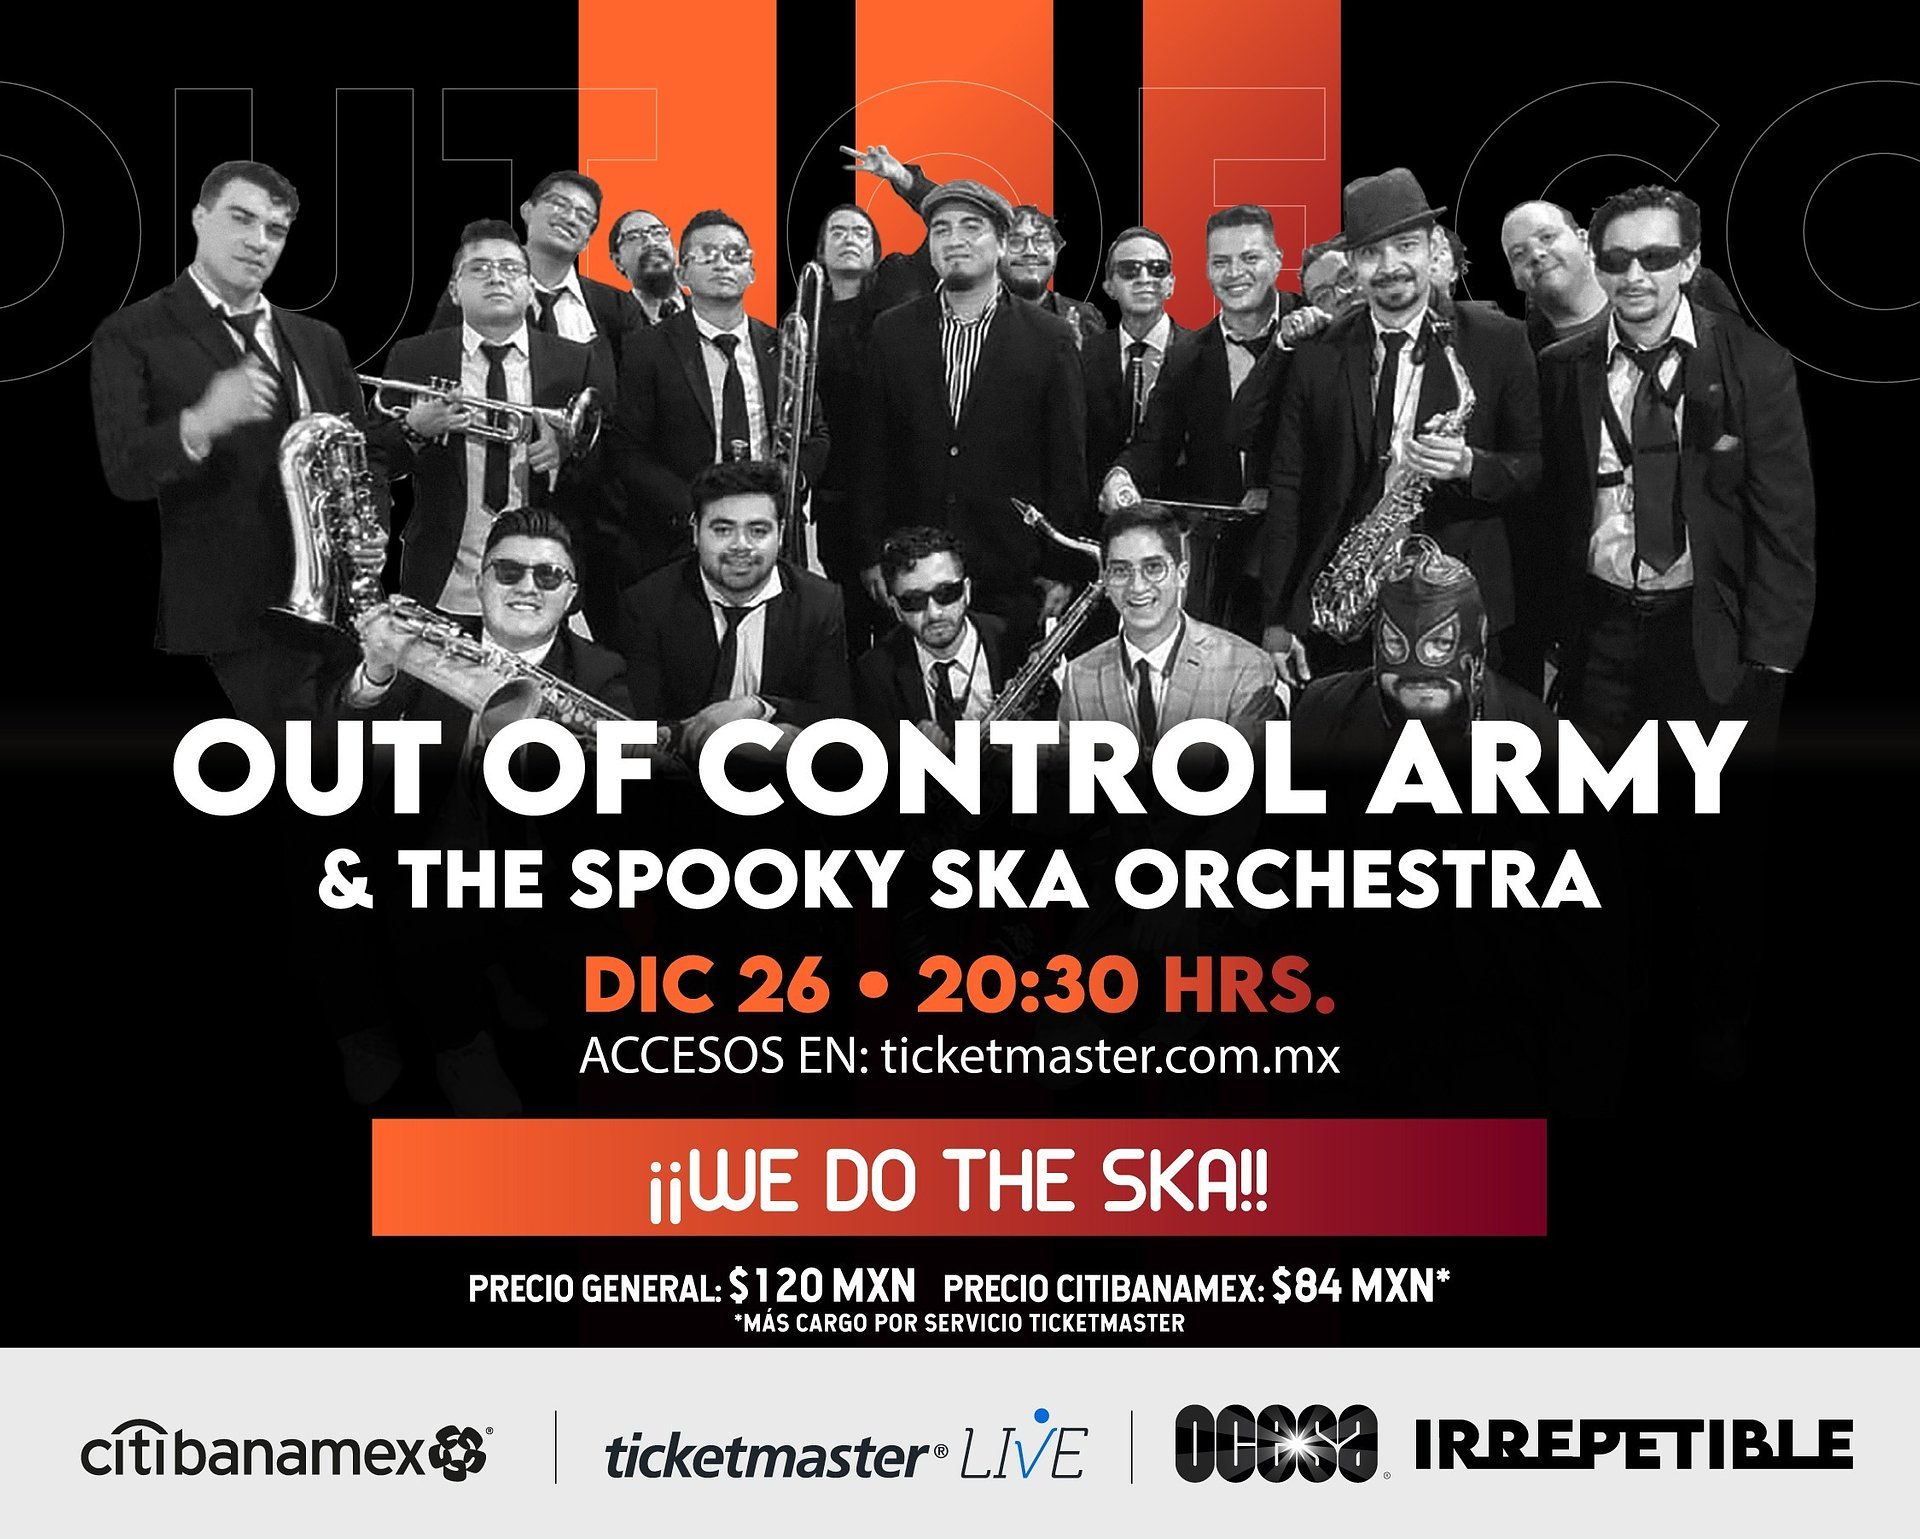 Invitación Conferencia de Prensa Virtual Out Of Control Army & The Spooky Ska Orchestra